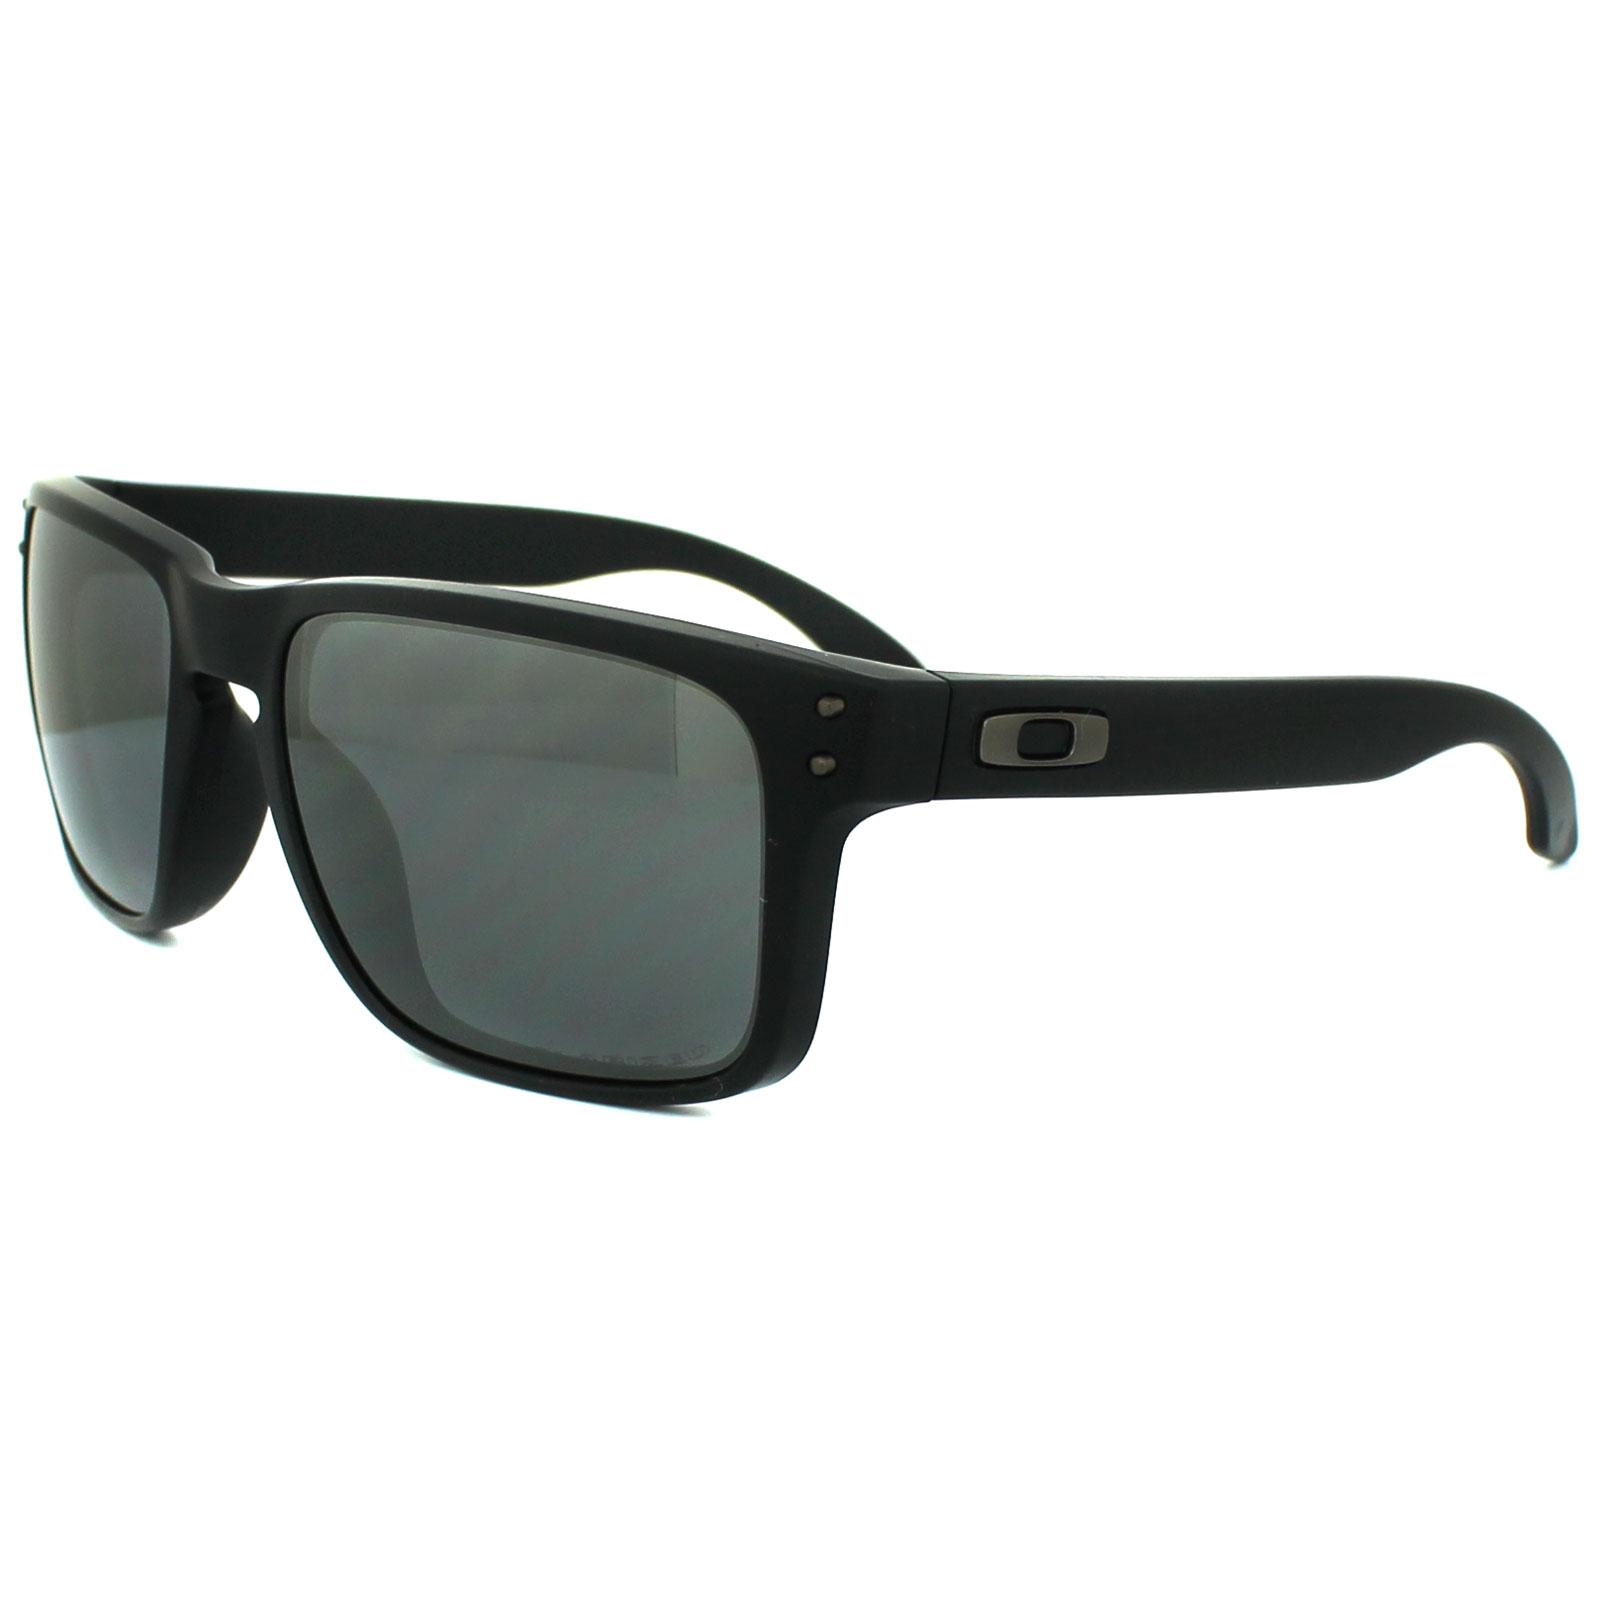 6bf6e3e3a1 Sentinel Oakley Sunglasses Holbrook OO9102-62 Matt Black Black Iridium  Polarized